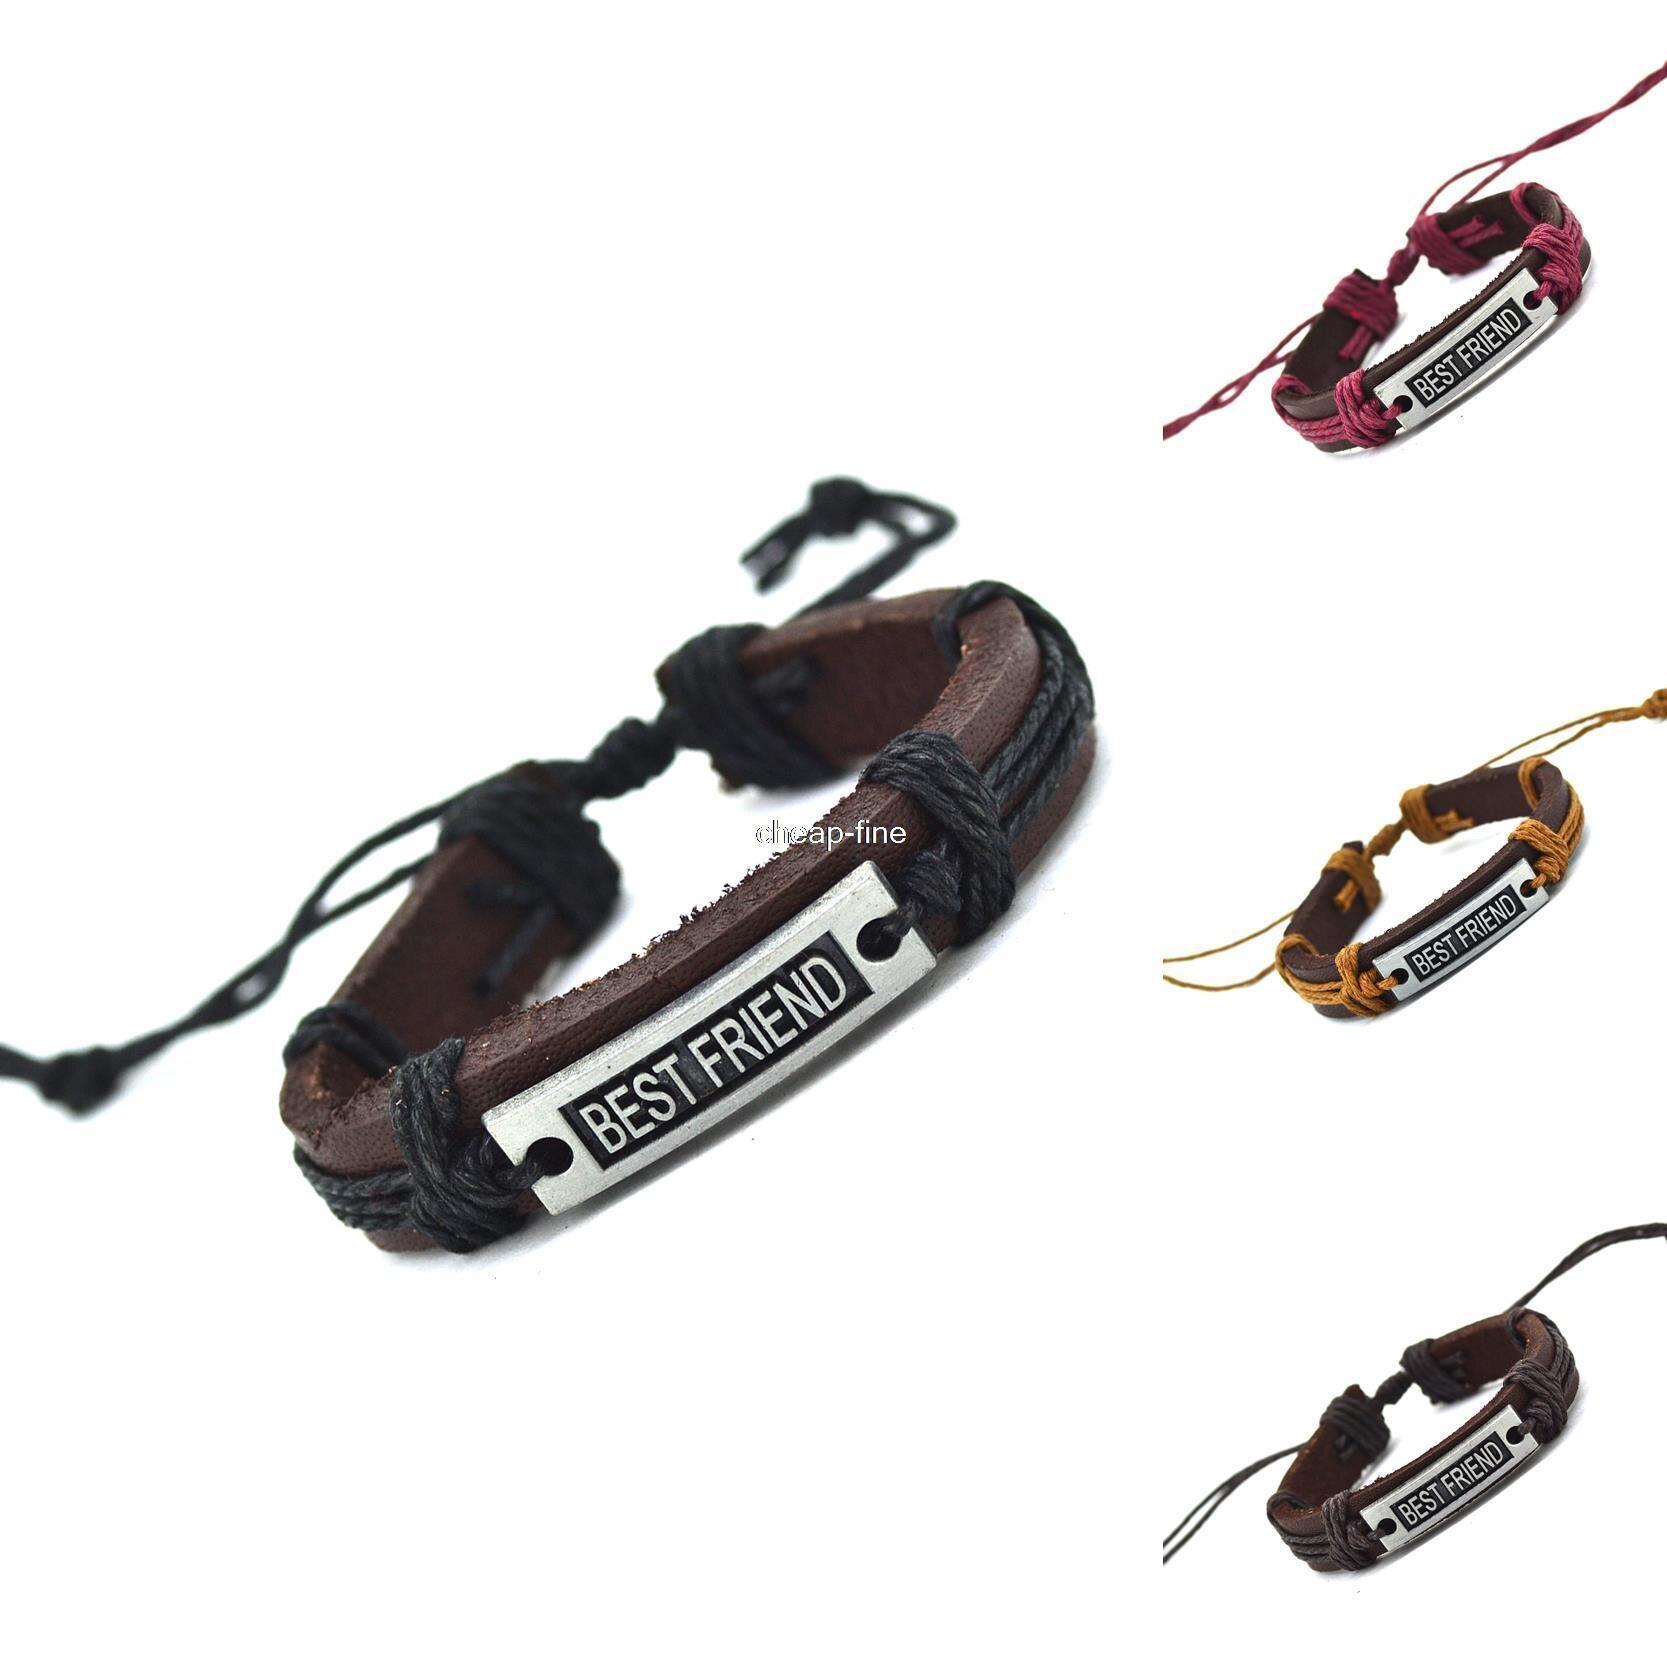 Popular Charm Bracelets Letters Buy Cheap Charm Bracelets Letters